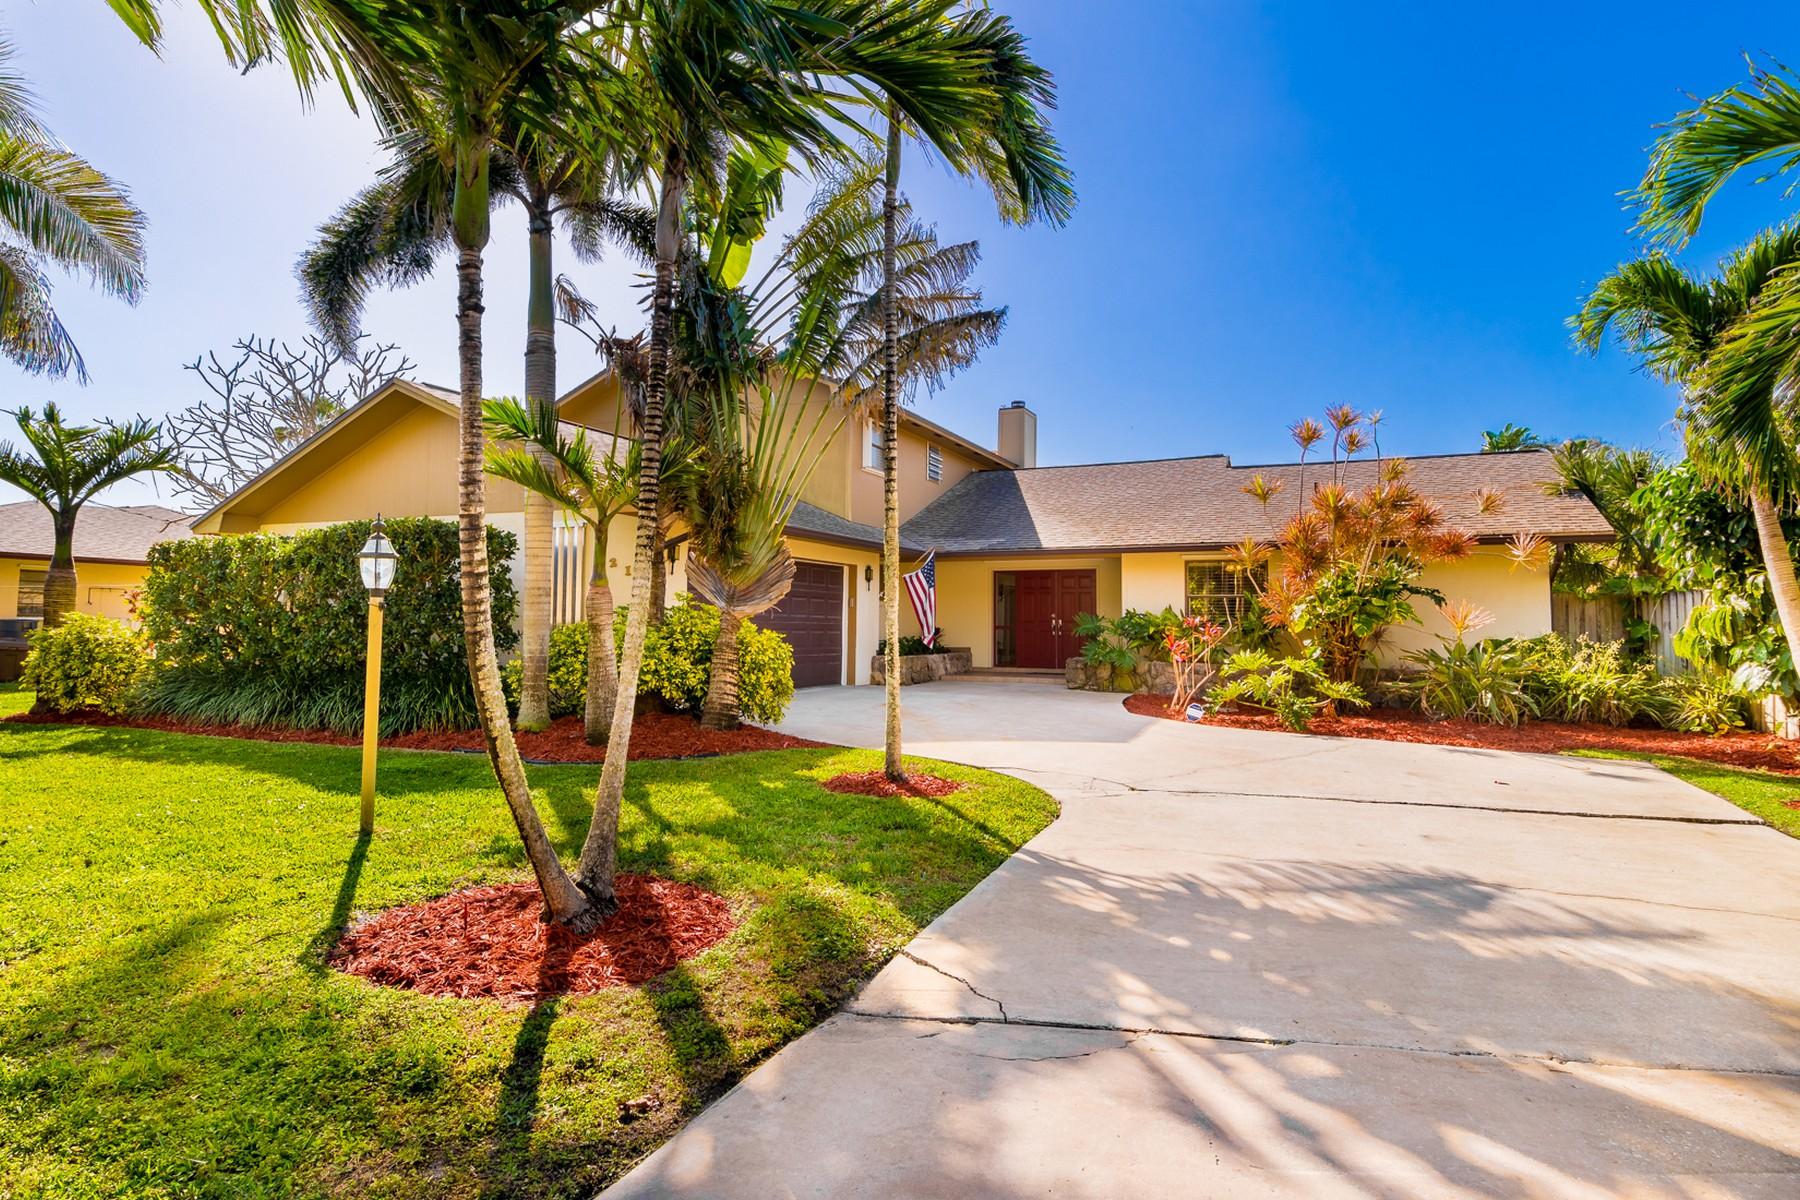 321 Nikomas Way 321 Nikomas Way Melbourne Beach, Florida 32951 Hoa Kỳ